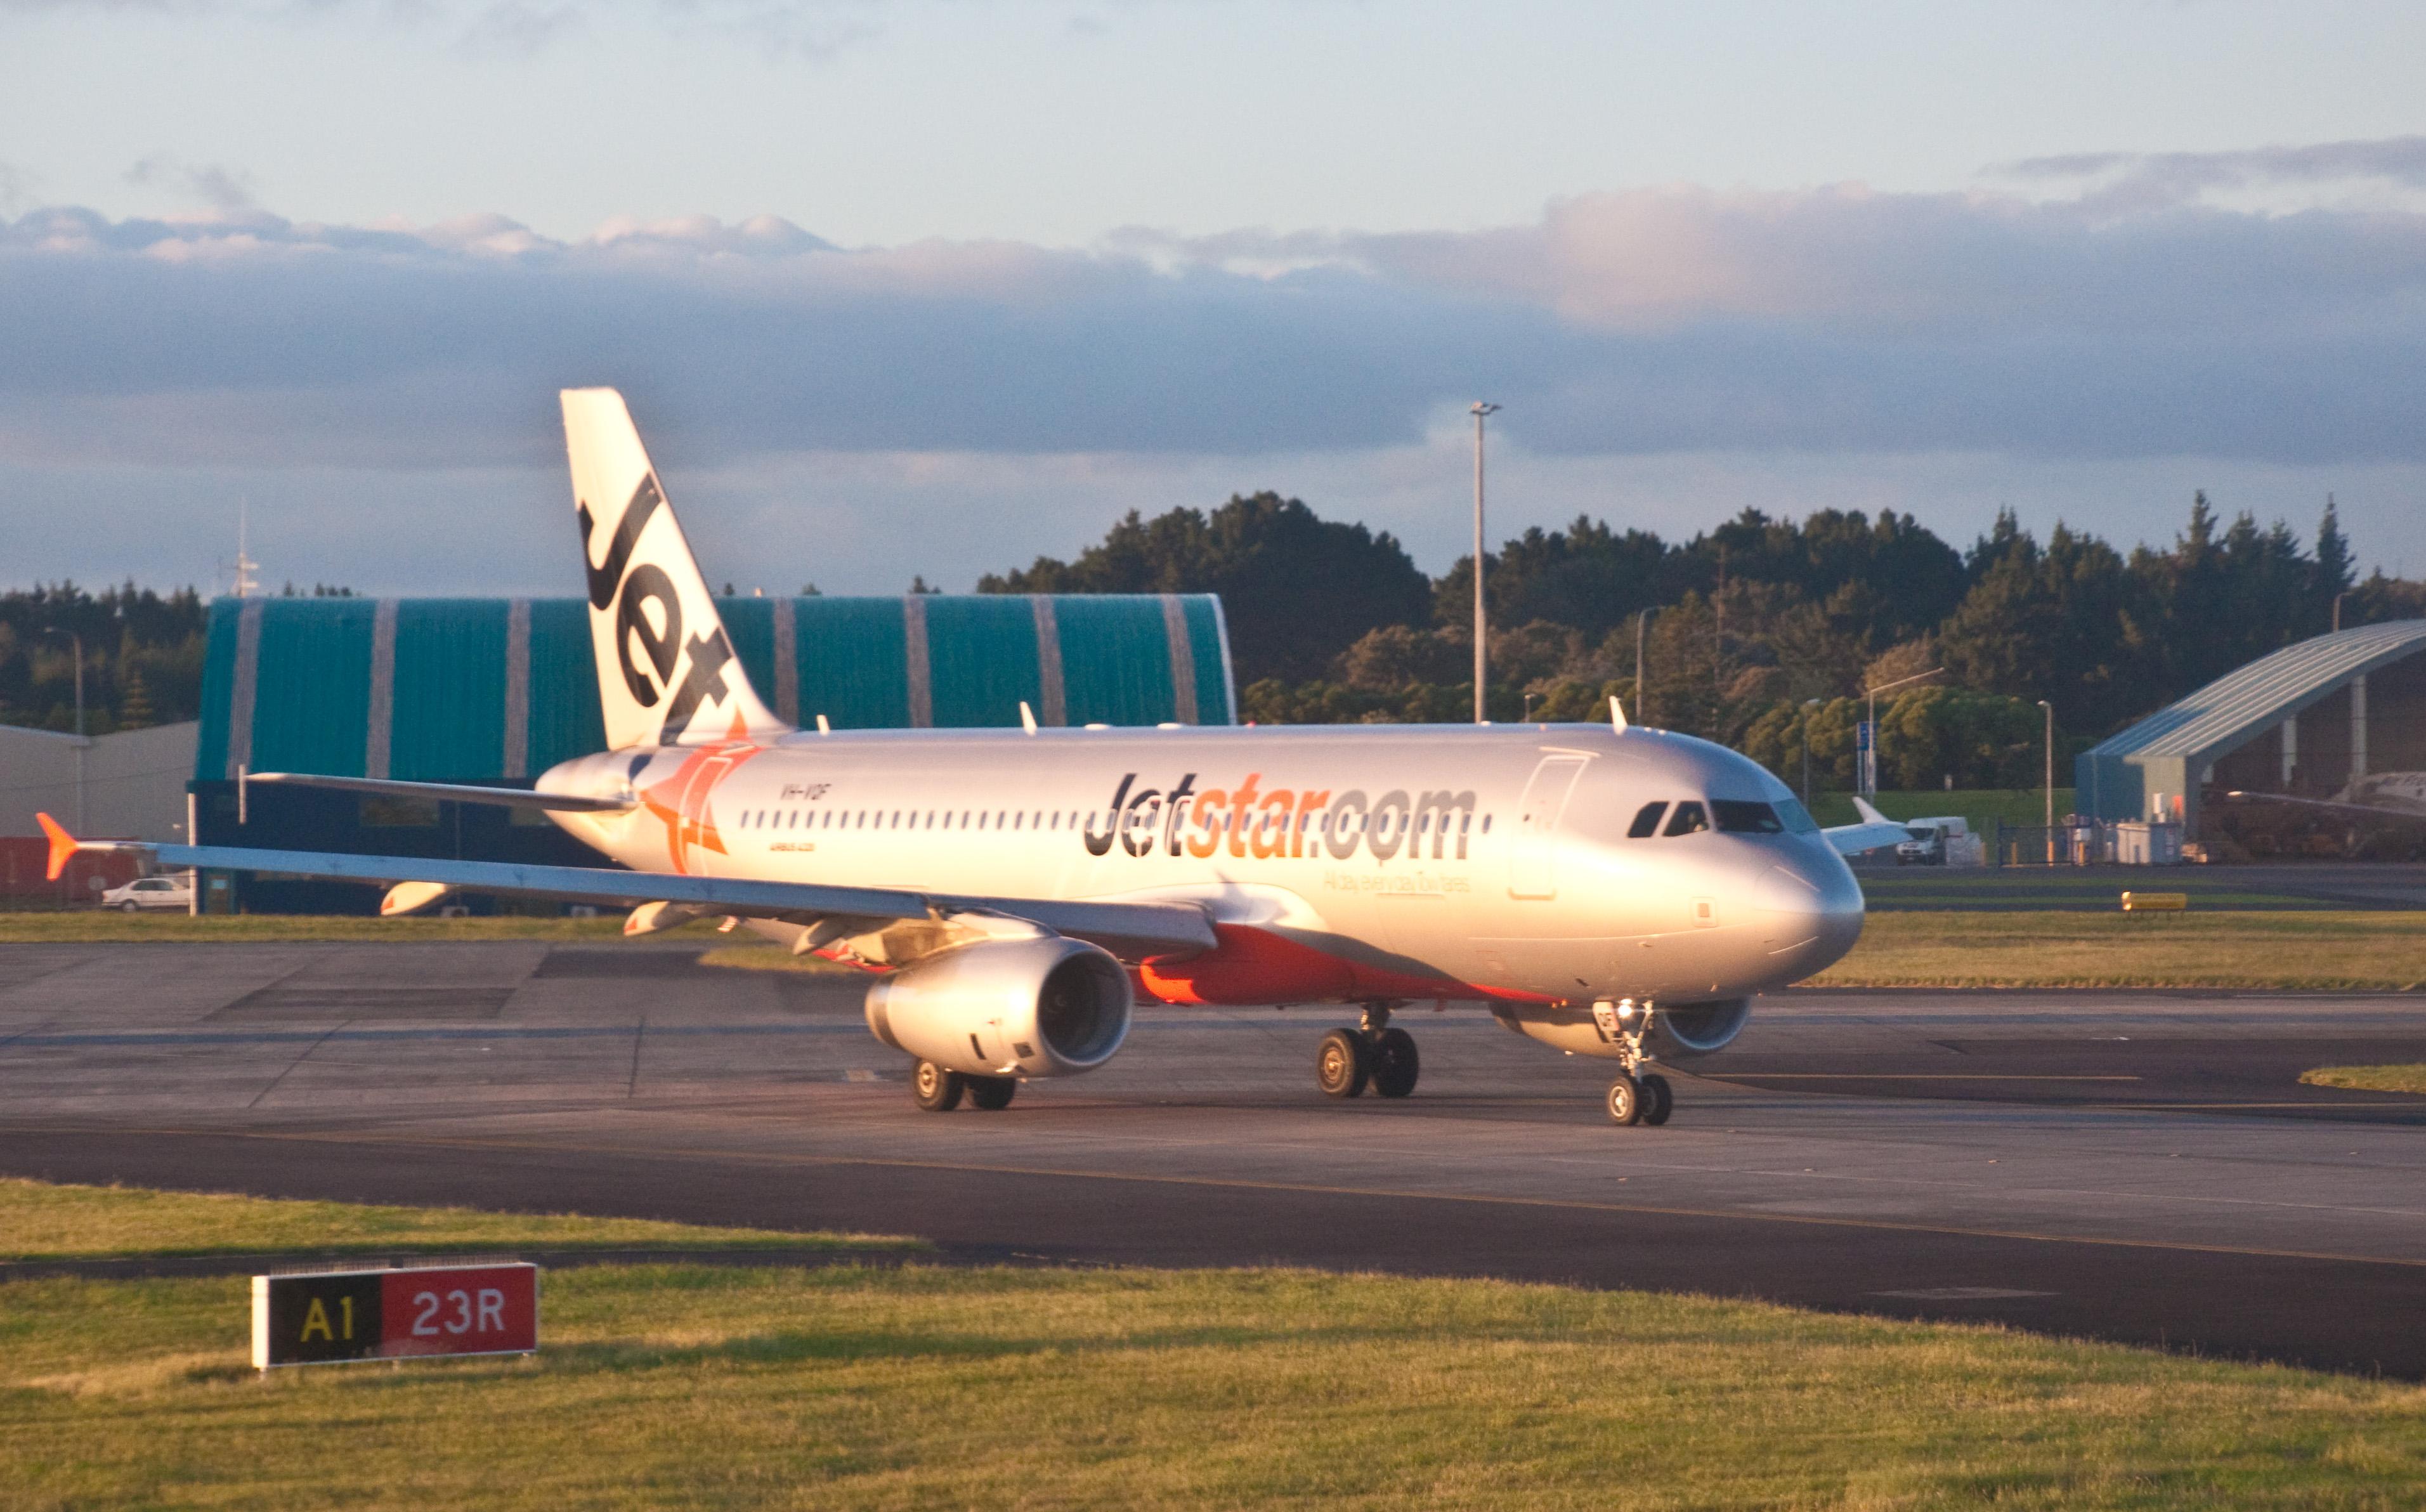 File:Jetstar A320, Auckland, 6 Nov. 2009.jpg - Wikimedia Commons